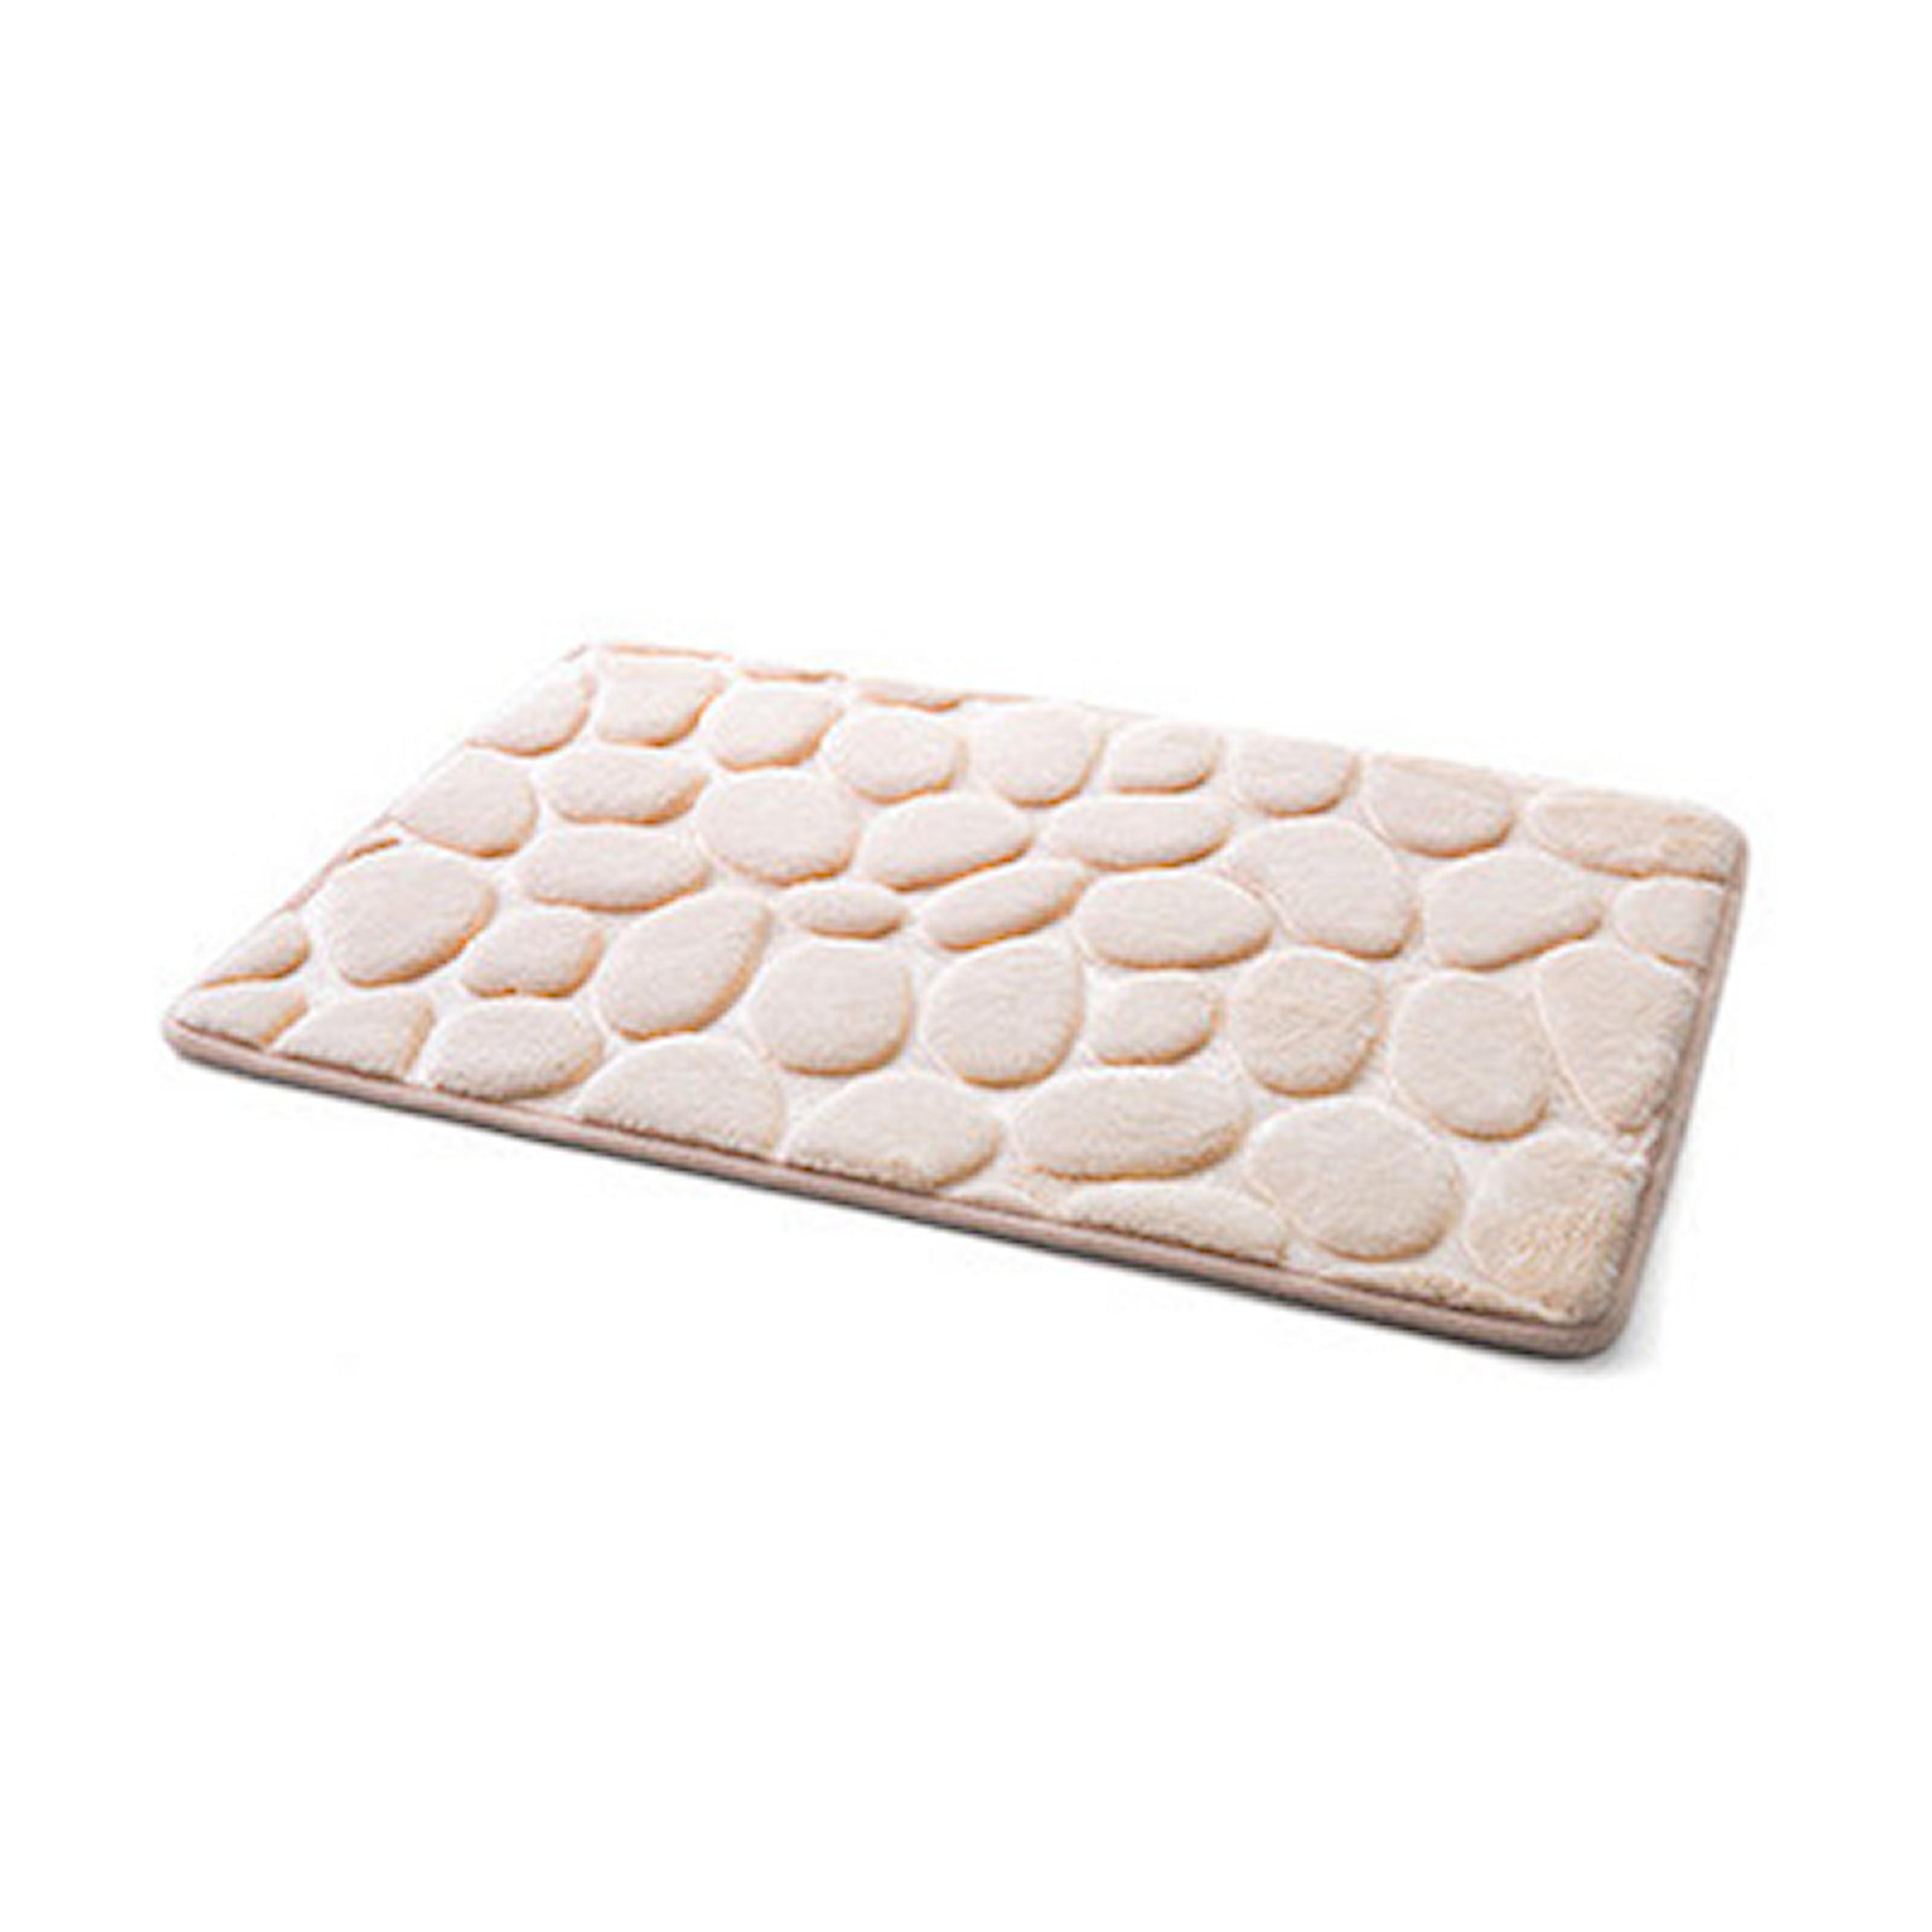 Beige, Bathroom Carpet Memory Foam, Muistivaahtomatto, ,